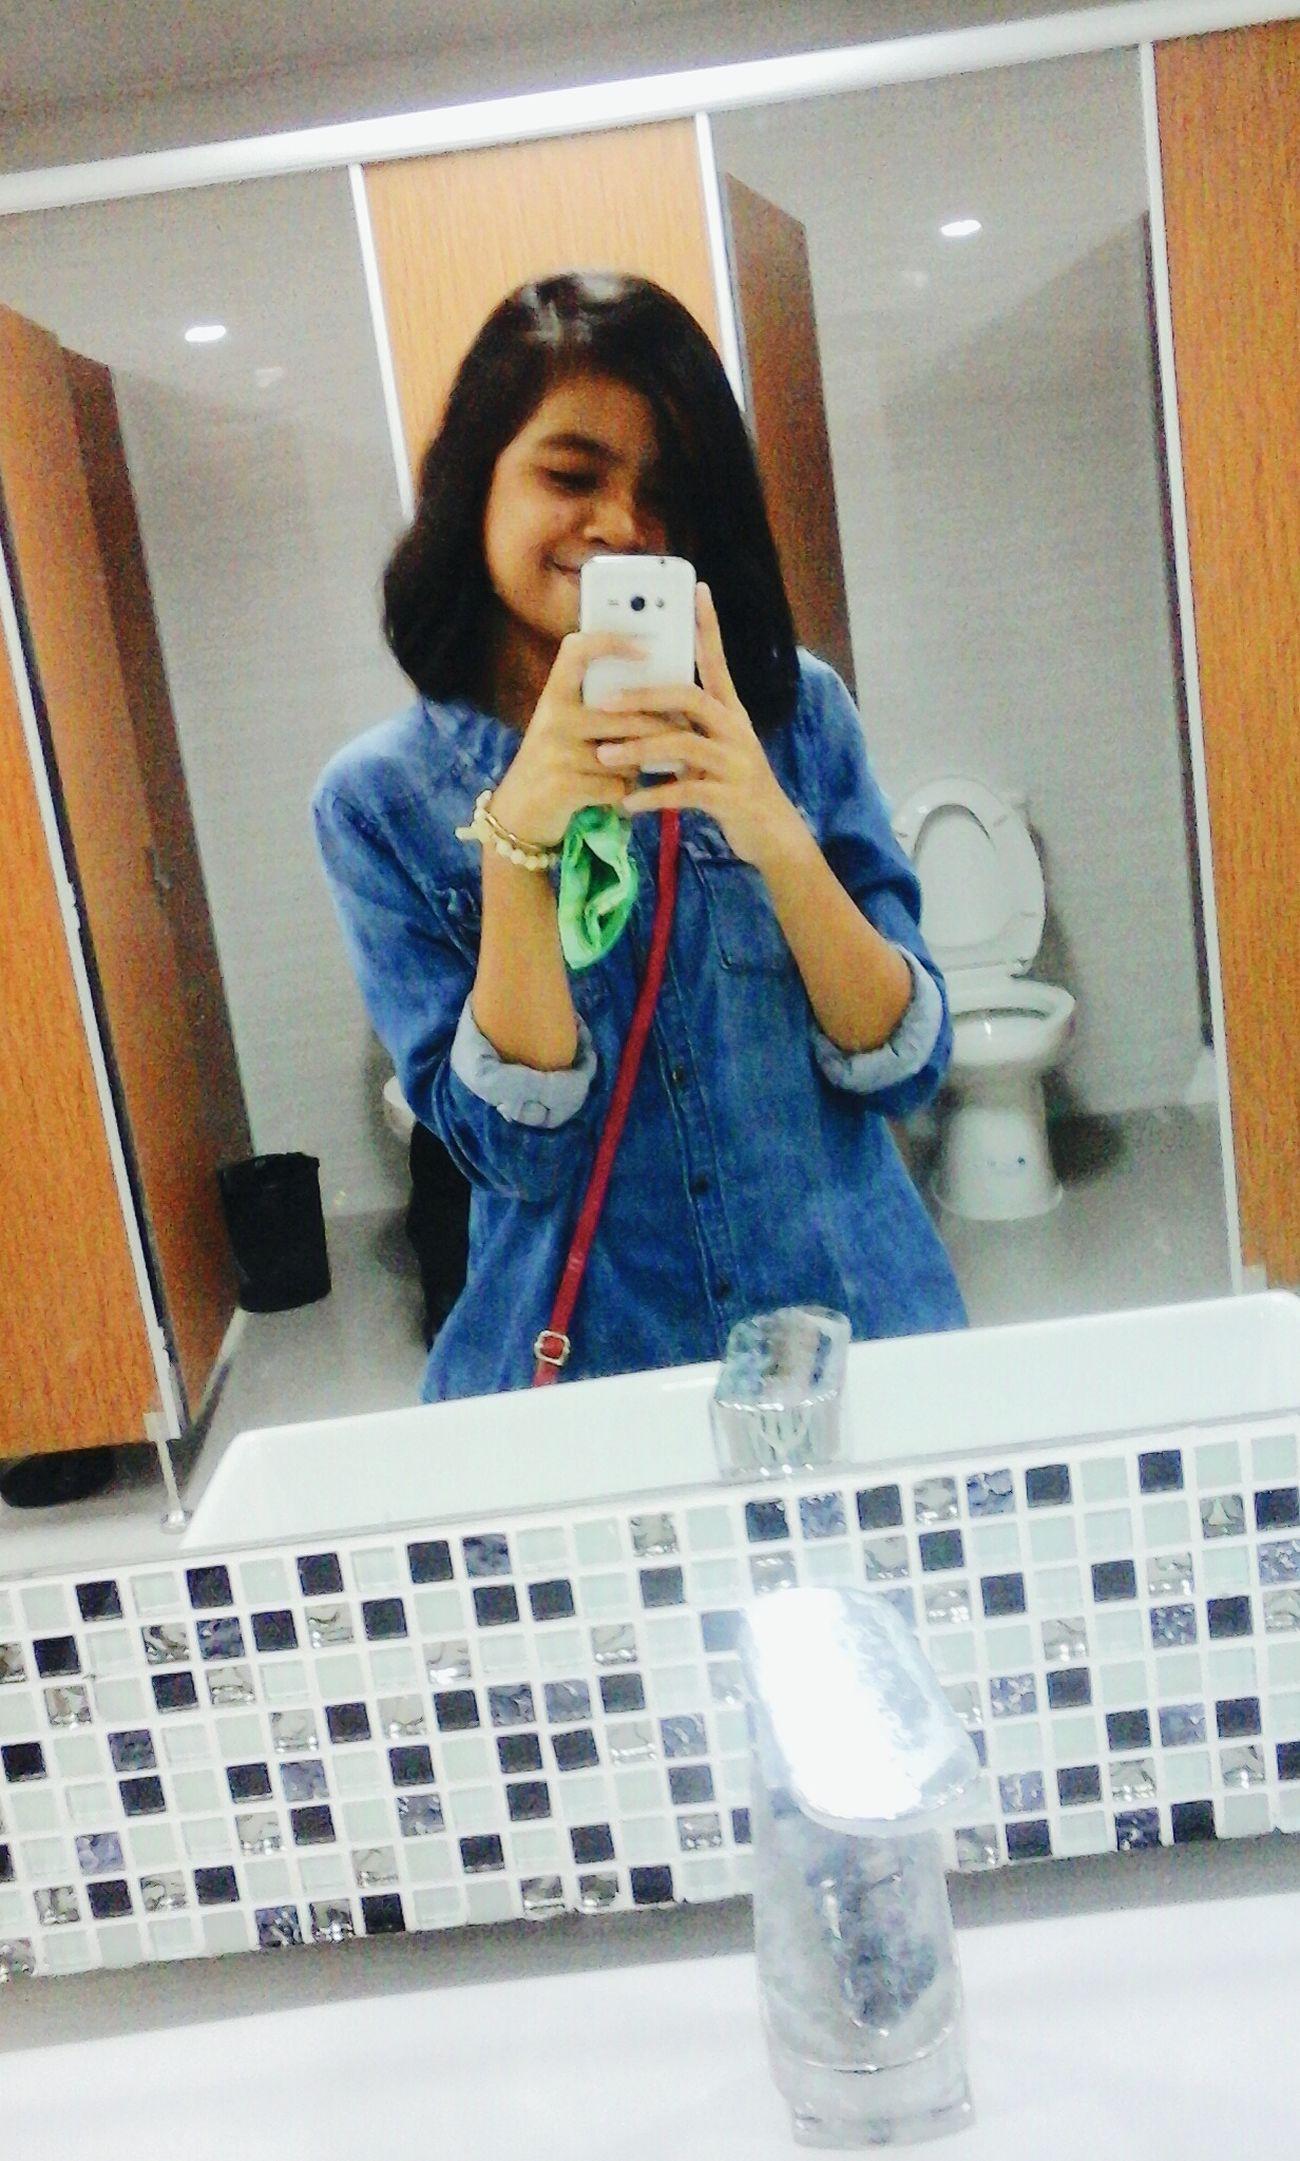 Throwbackthursday  Denim Hm Philippines Bored Ootd Lateupload Mirrorselfie Eye Em Selfie ✌Lifestyles Outdoors Lavatory